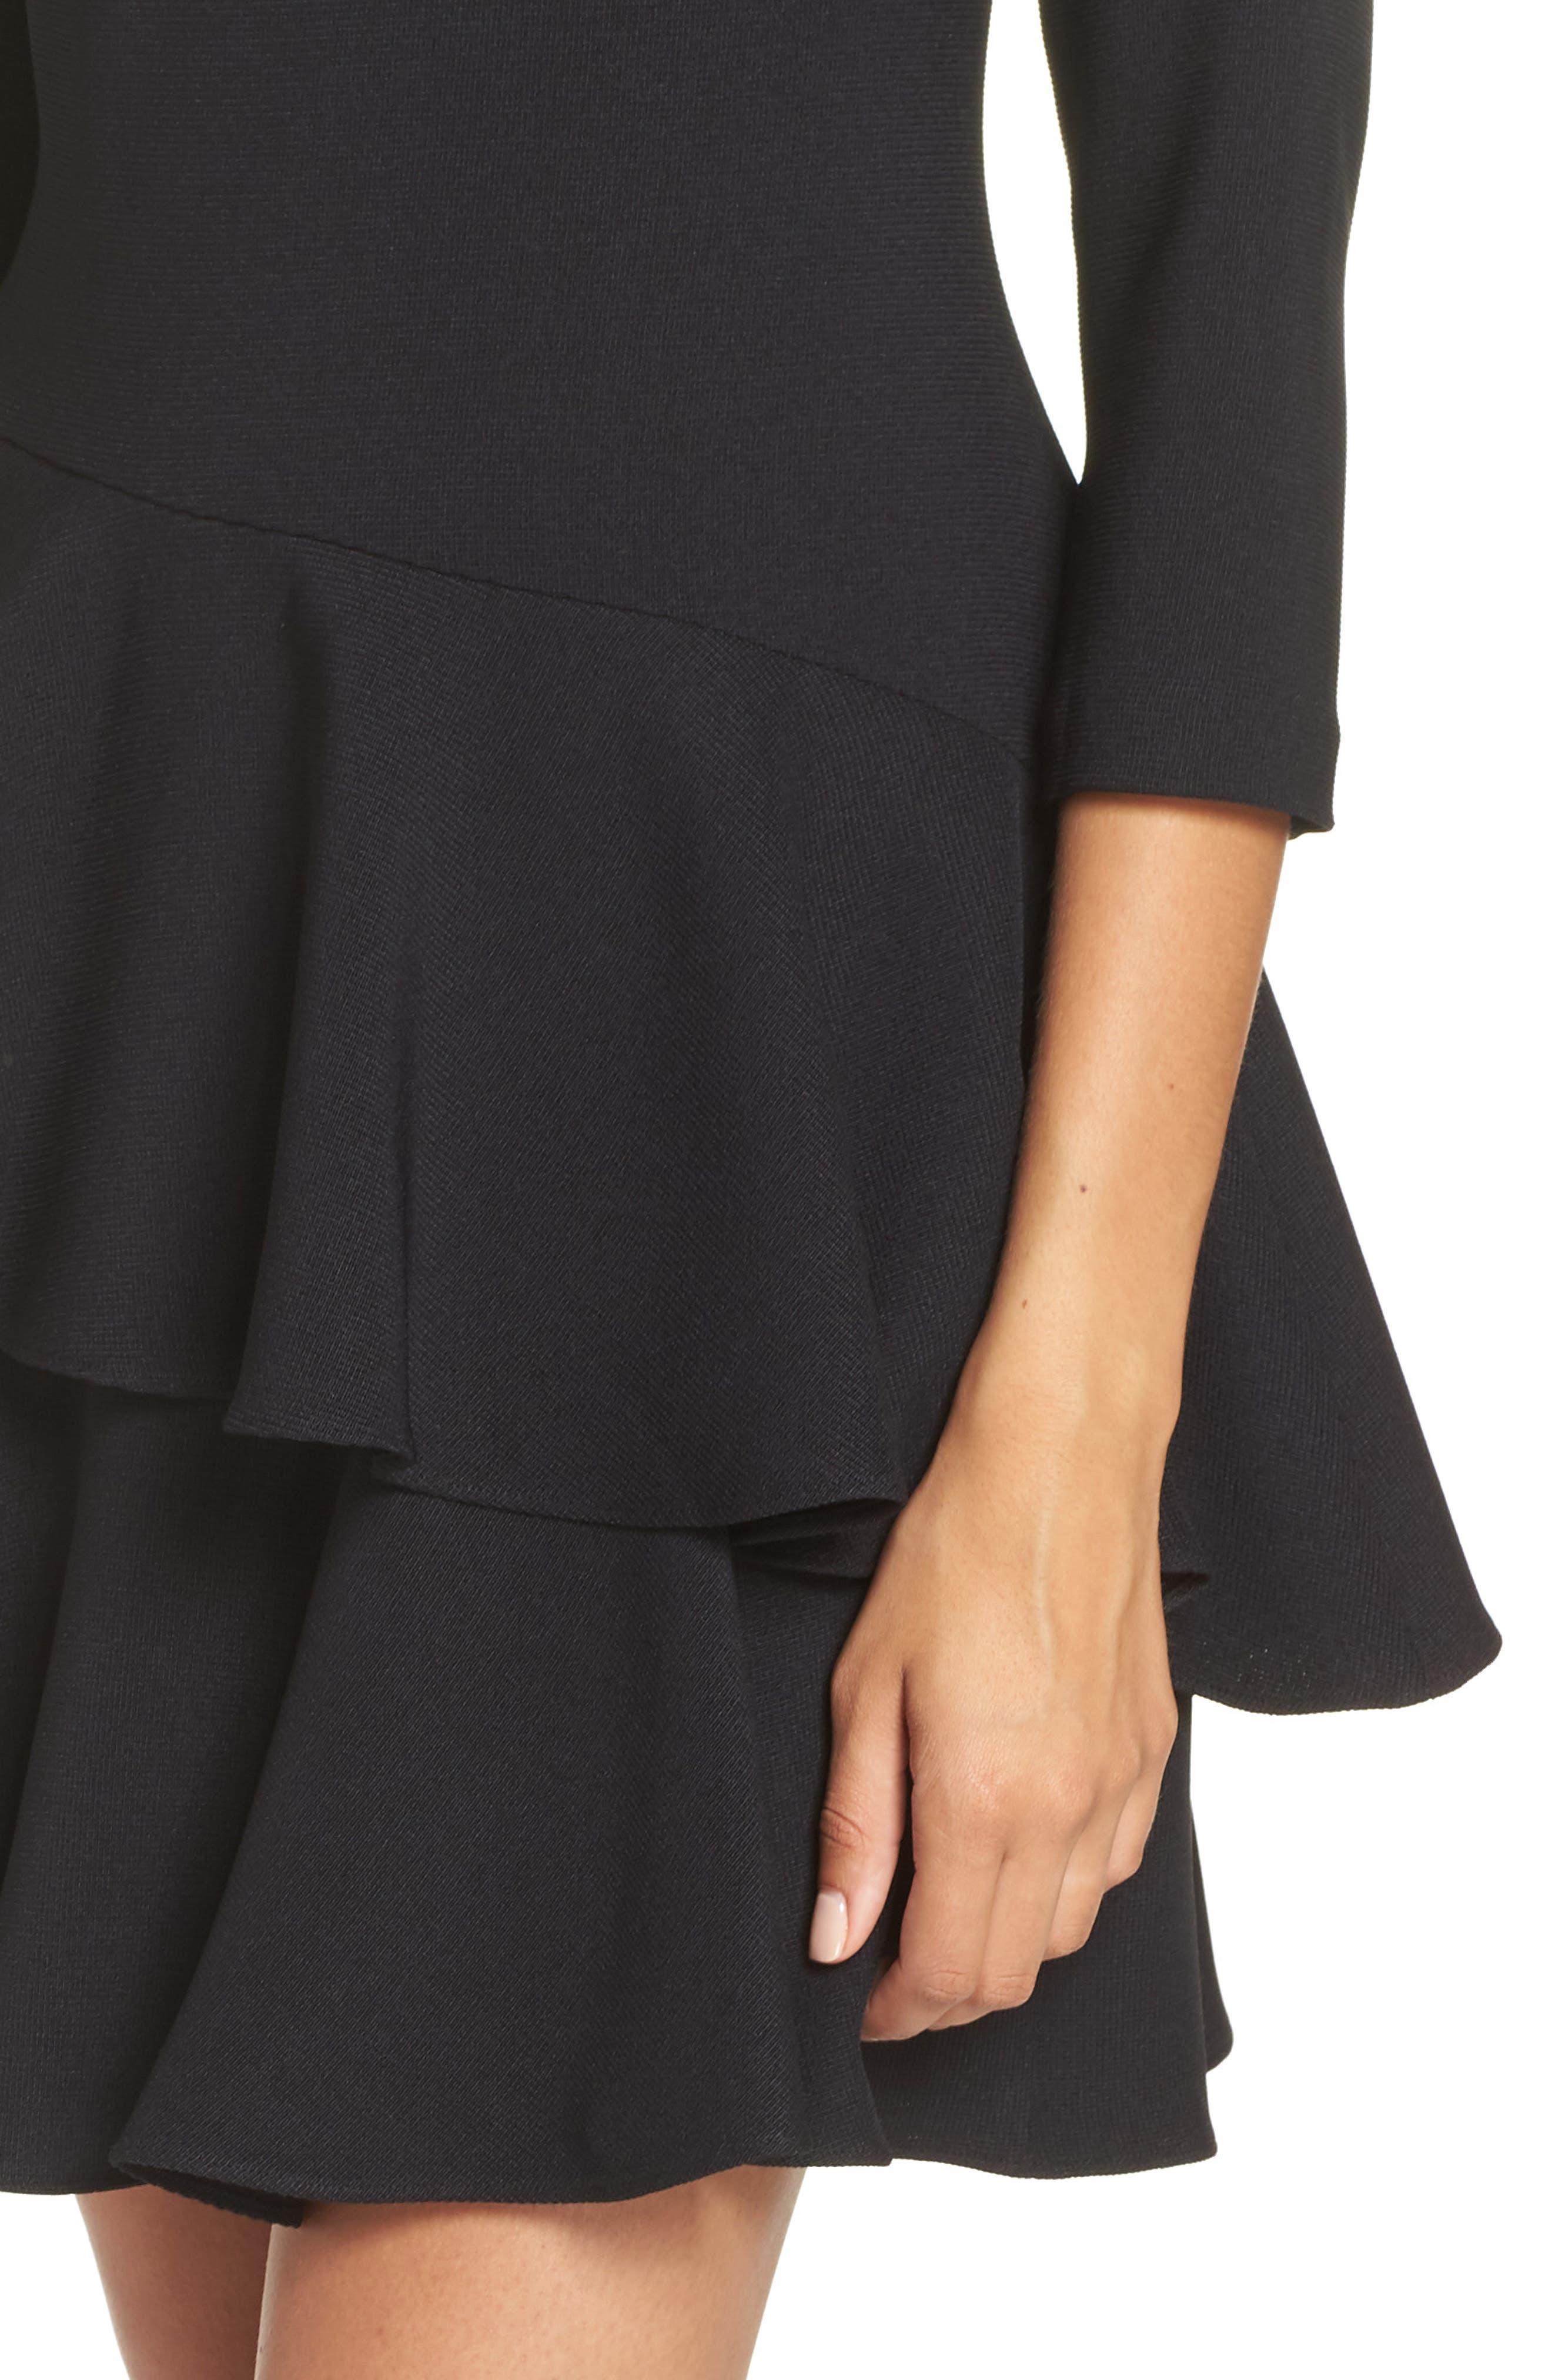 ELIZA J, Tiered Ruffle Knit Dress, Alternate thumbnail 5, color, 001